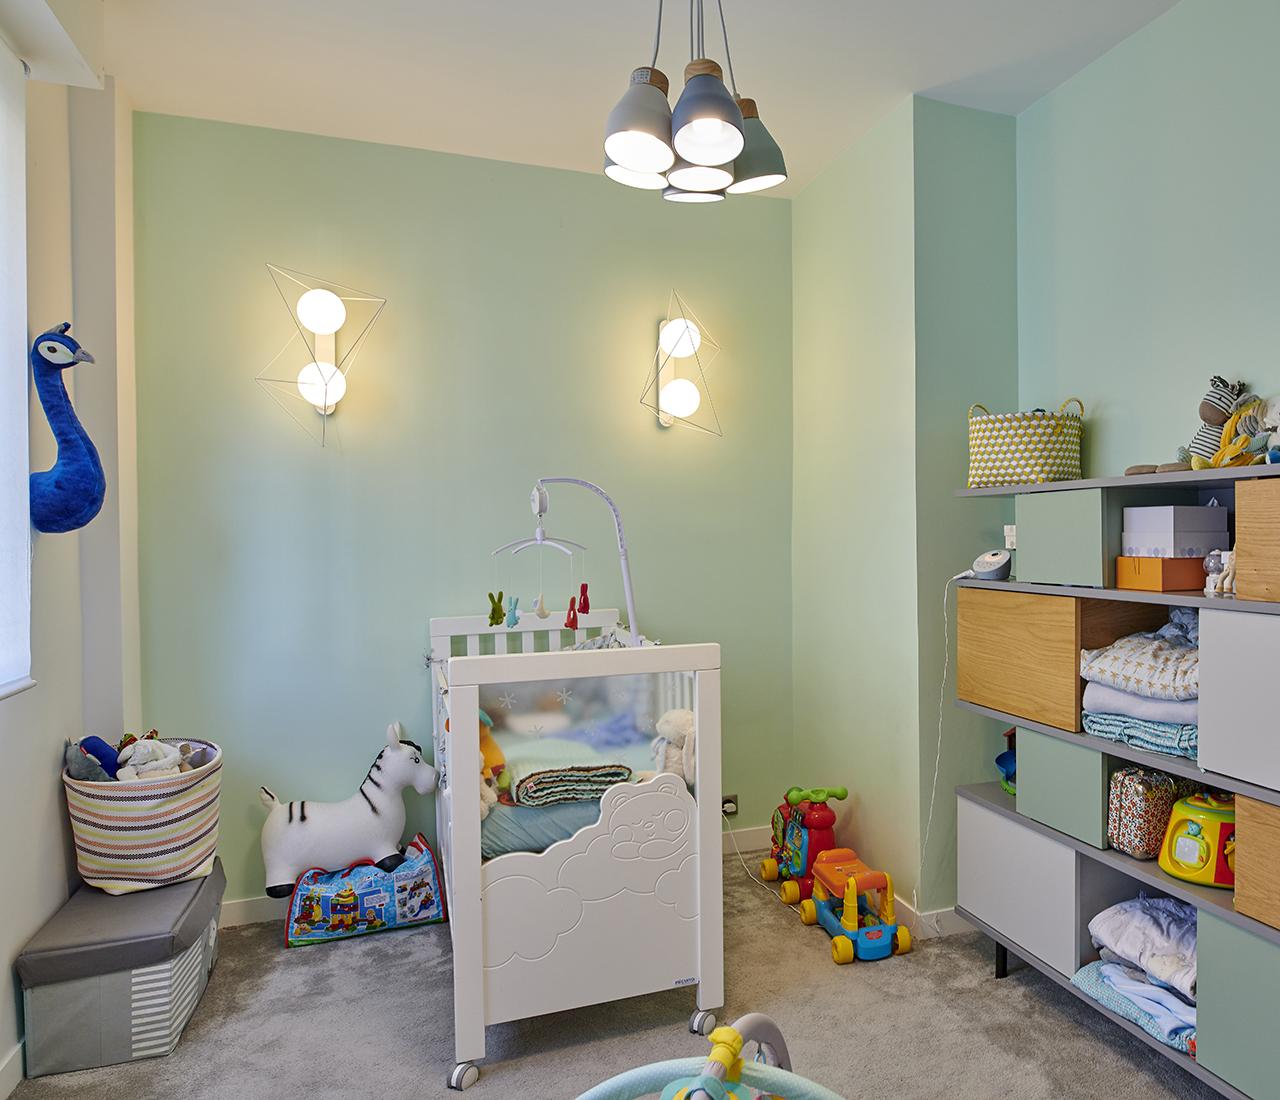 st-germain_childroom_3